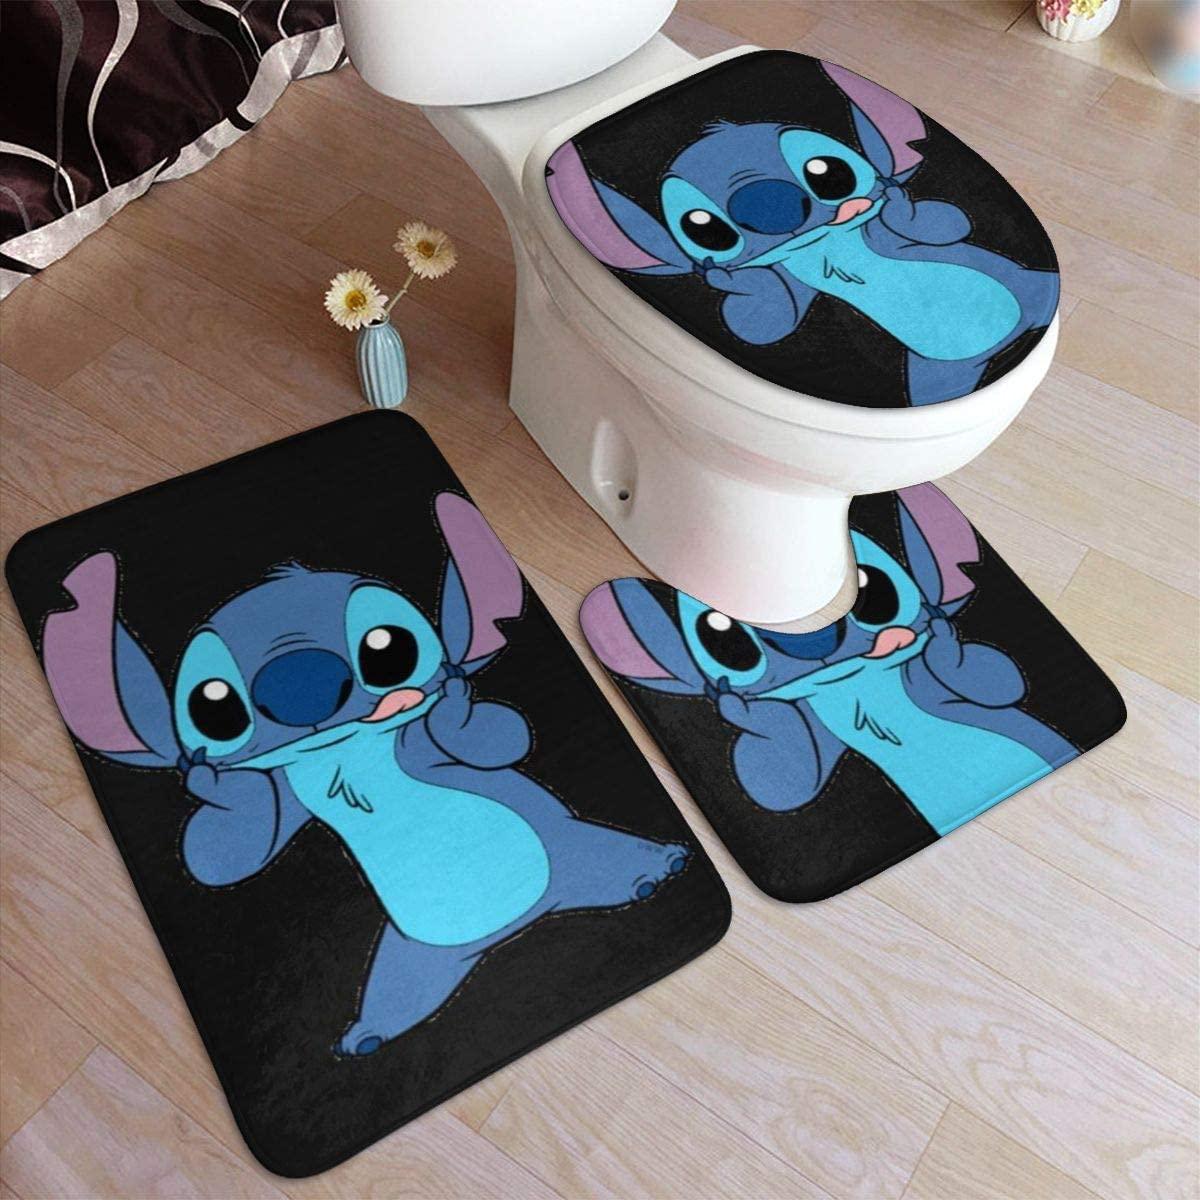 Bathroom Rug Set 3 Piece, Stylish Naughty Stitch Print, Non Slip Bath Mat + U-Shaped Contour Rug + Toilet Lid Cover